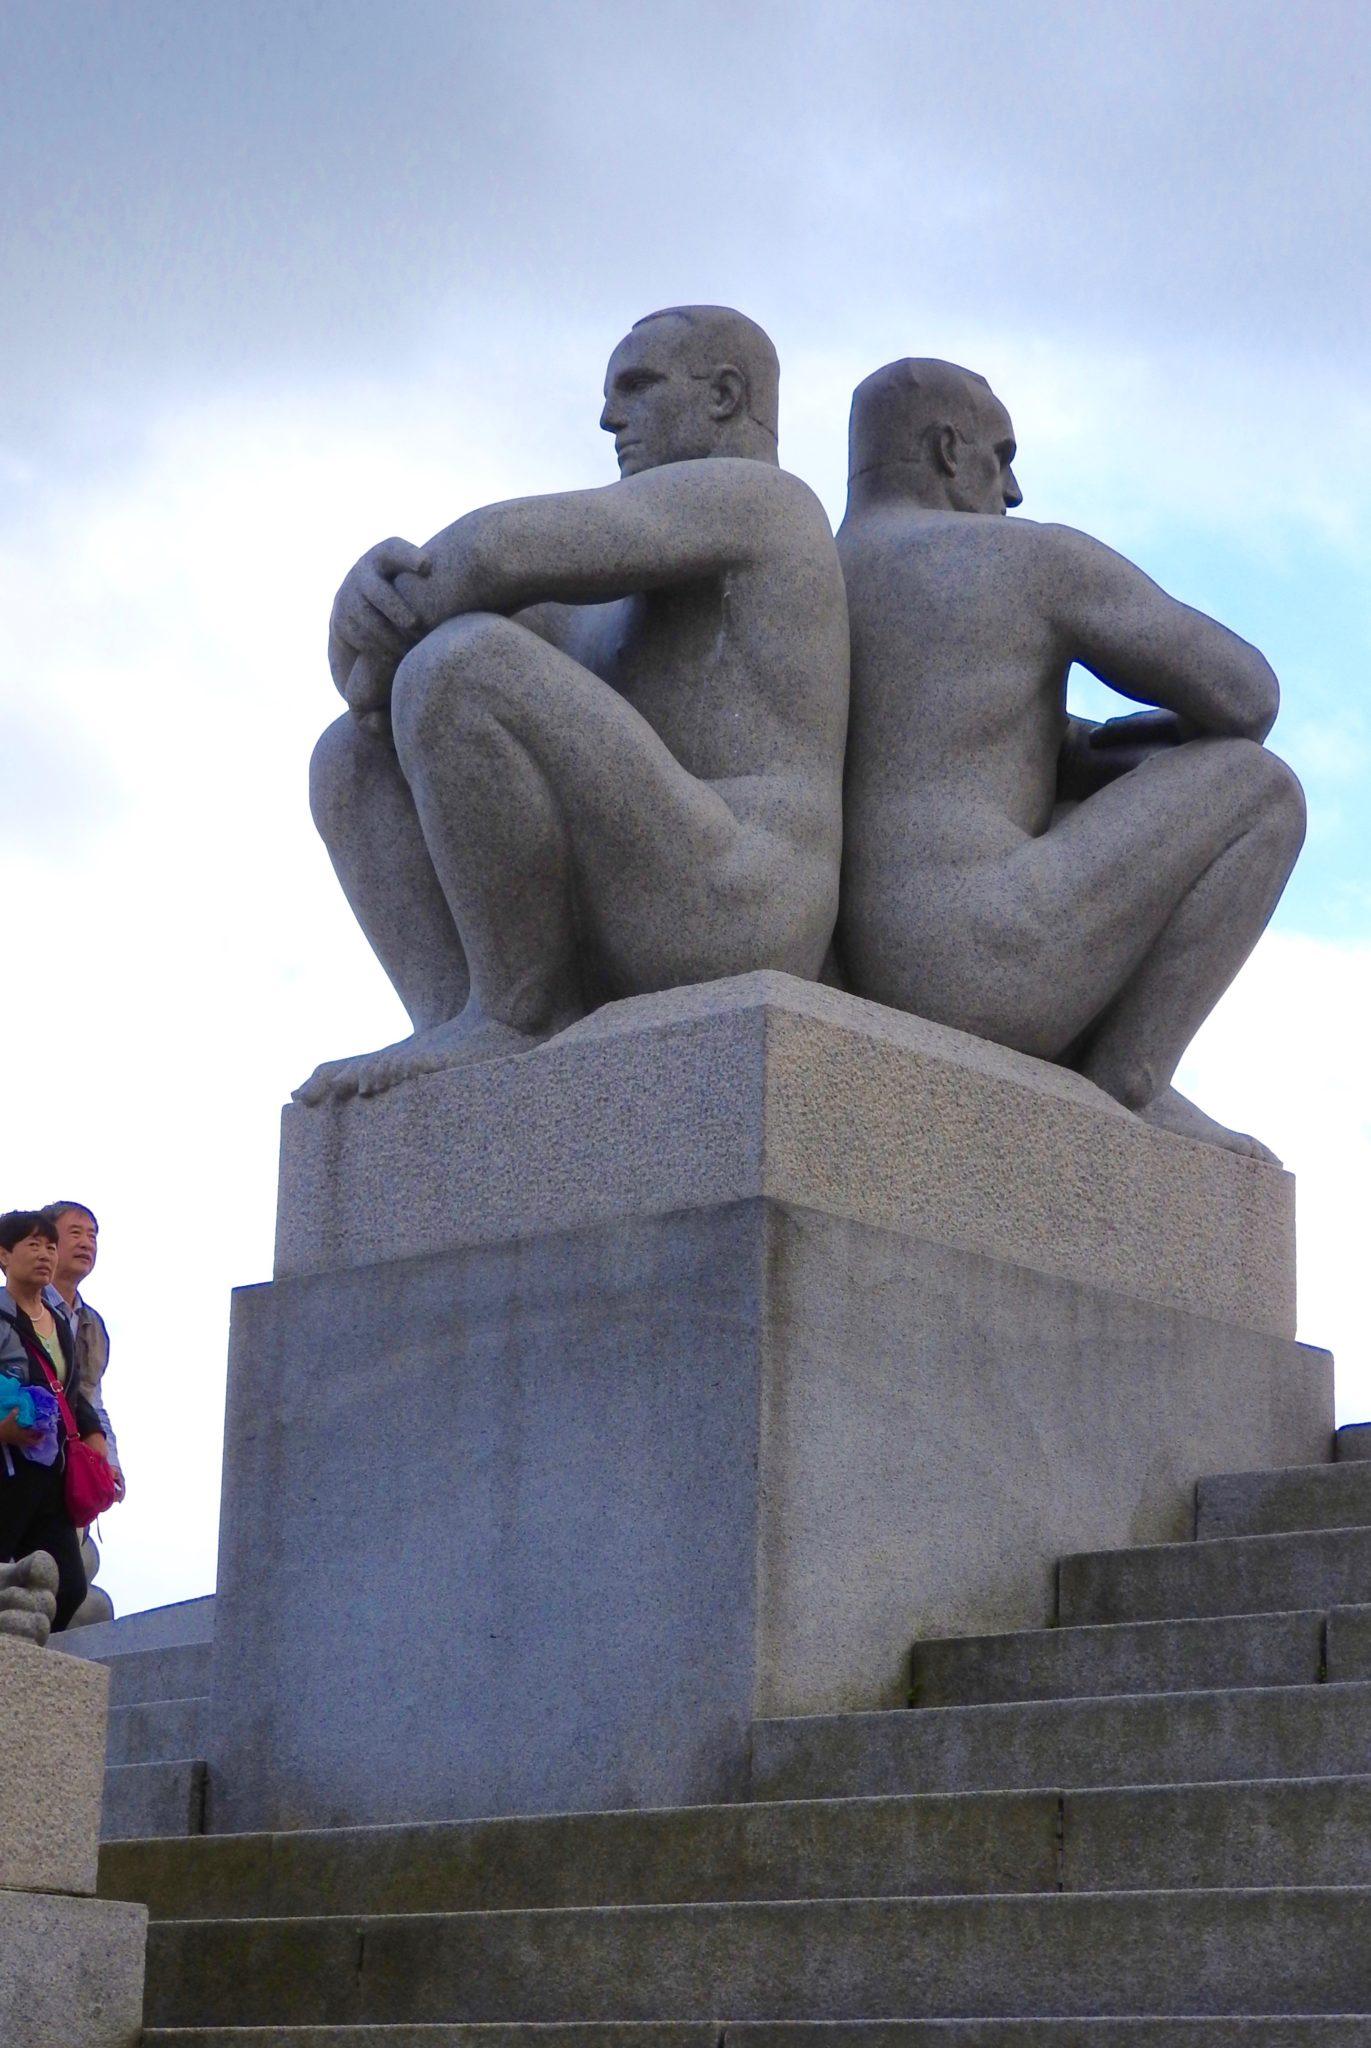 Granite statues of men sitting back to back